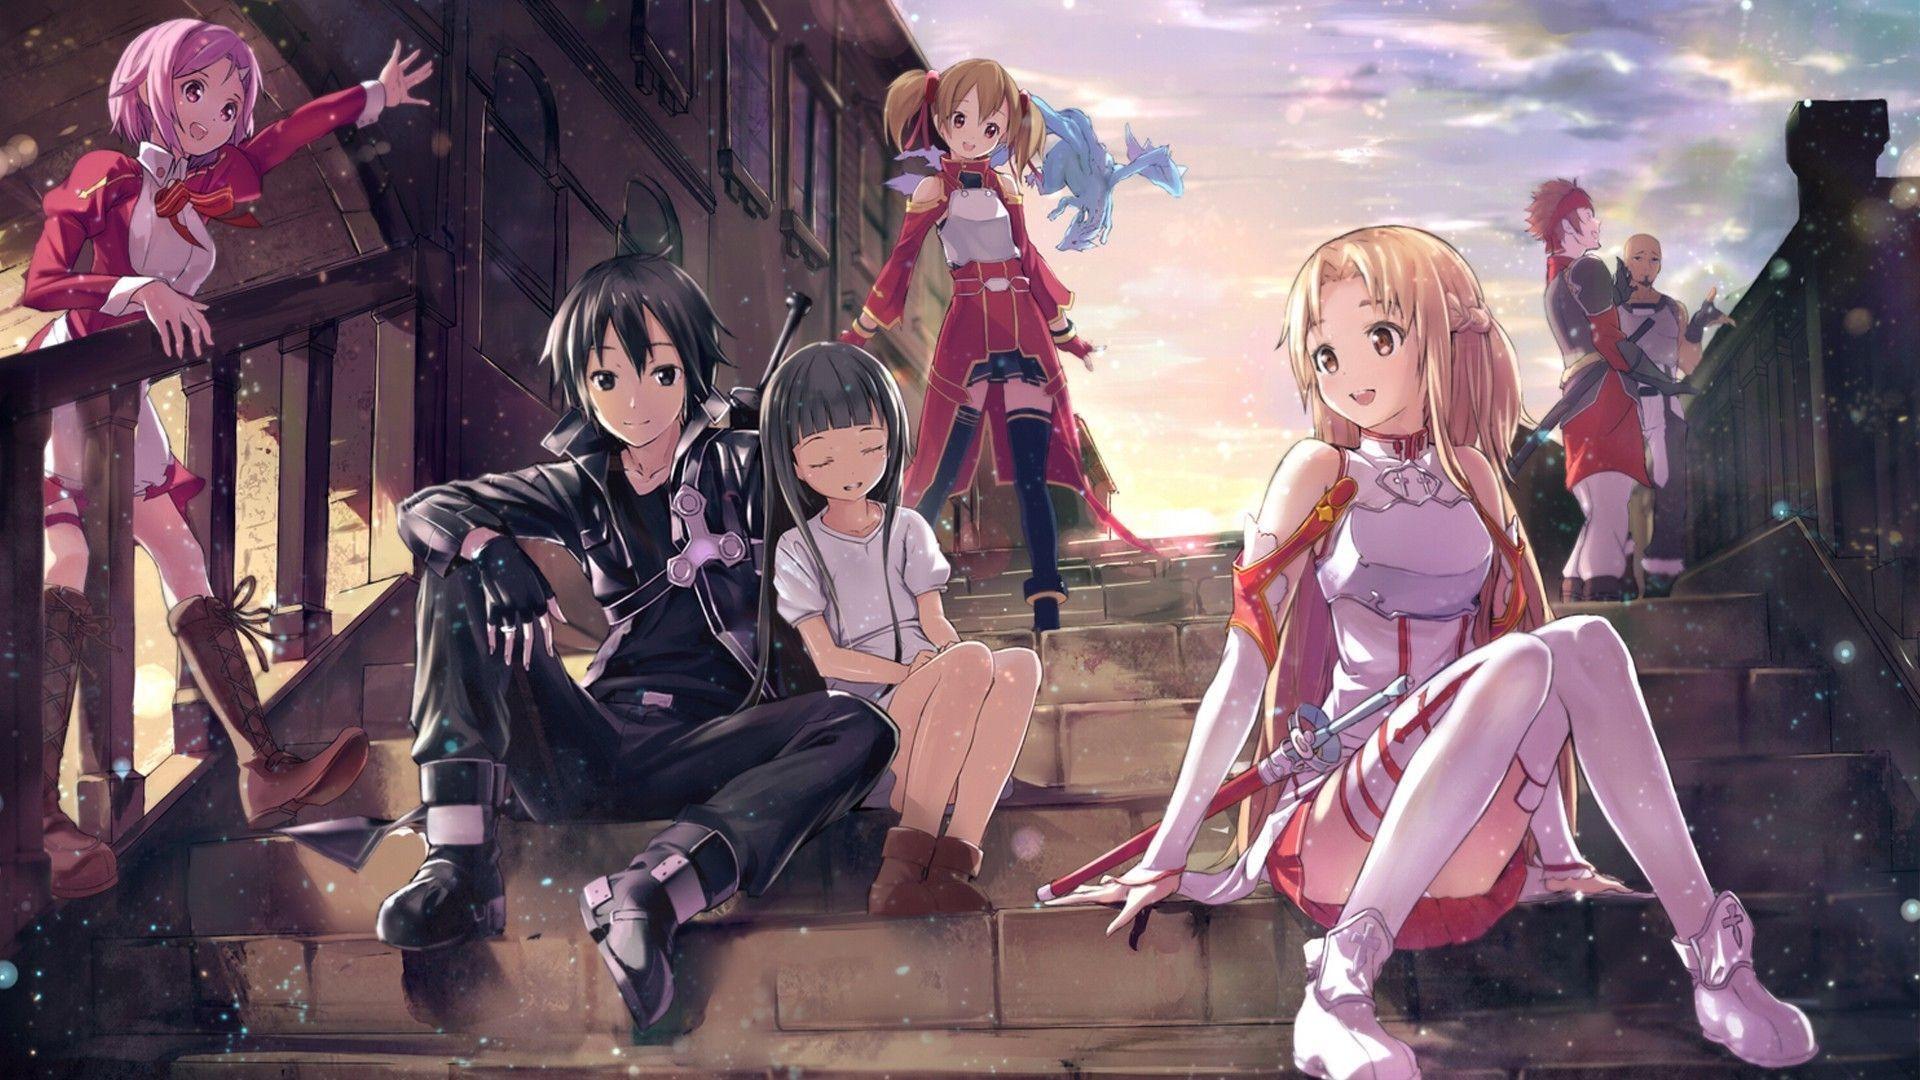 Sword Art Online Wallpaper Full Hd